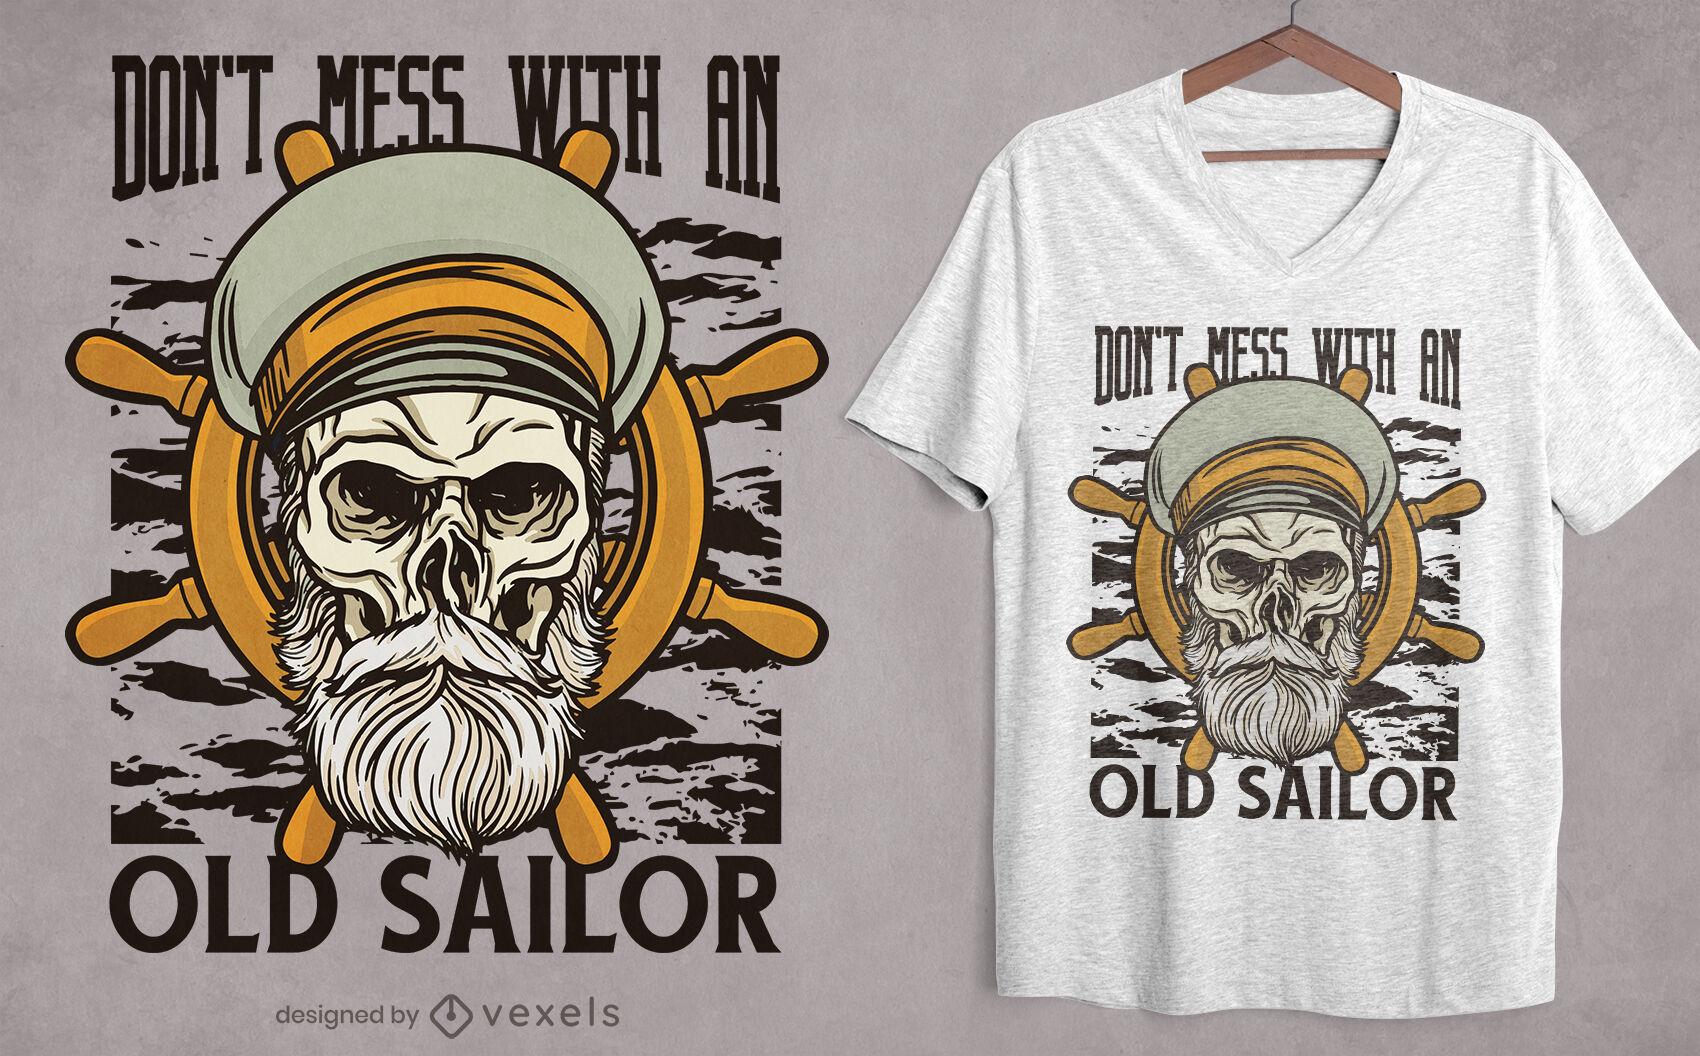 Matrosenschädel-Illustrations-T-Shirt-Design